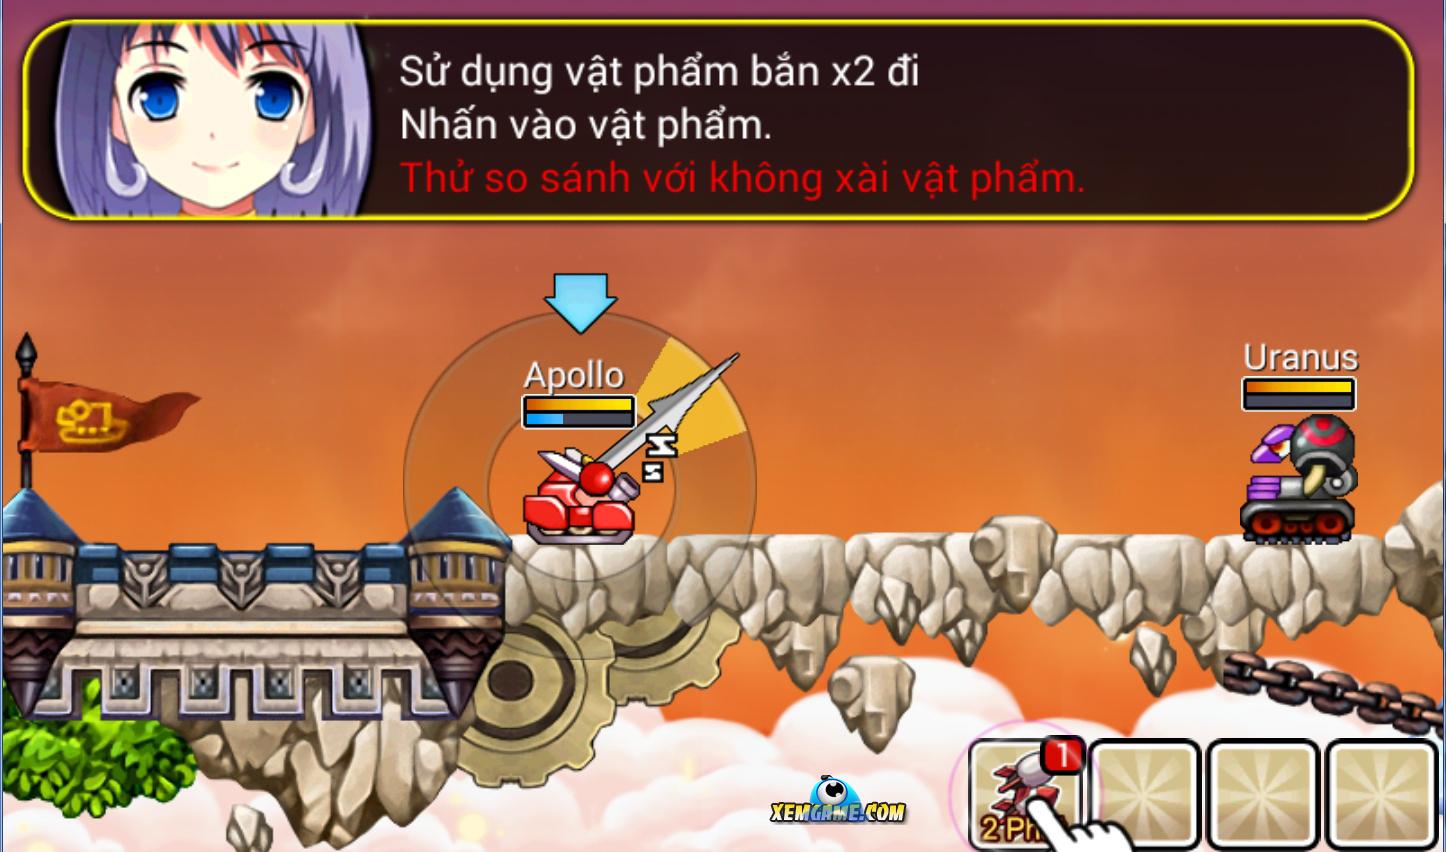 game-oppa_-tank-mobile-6.jpg (1446×852)